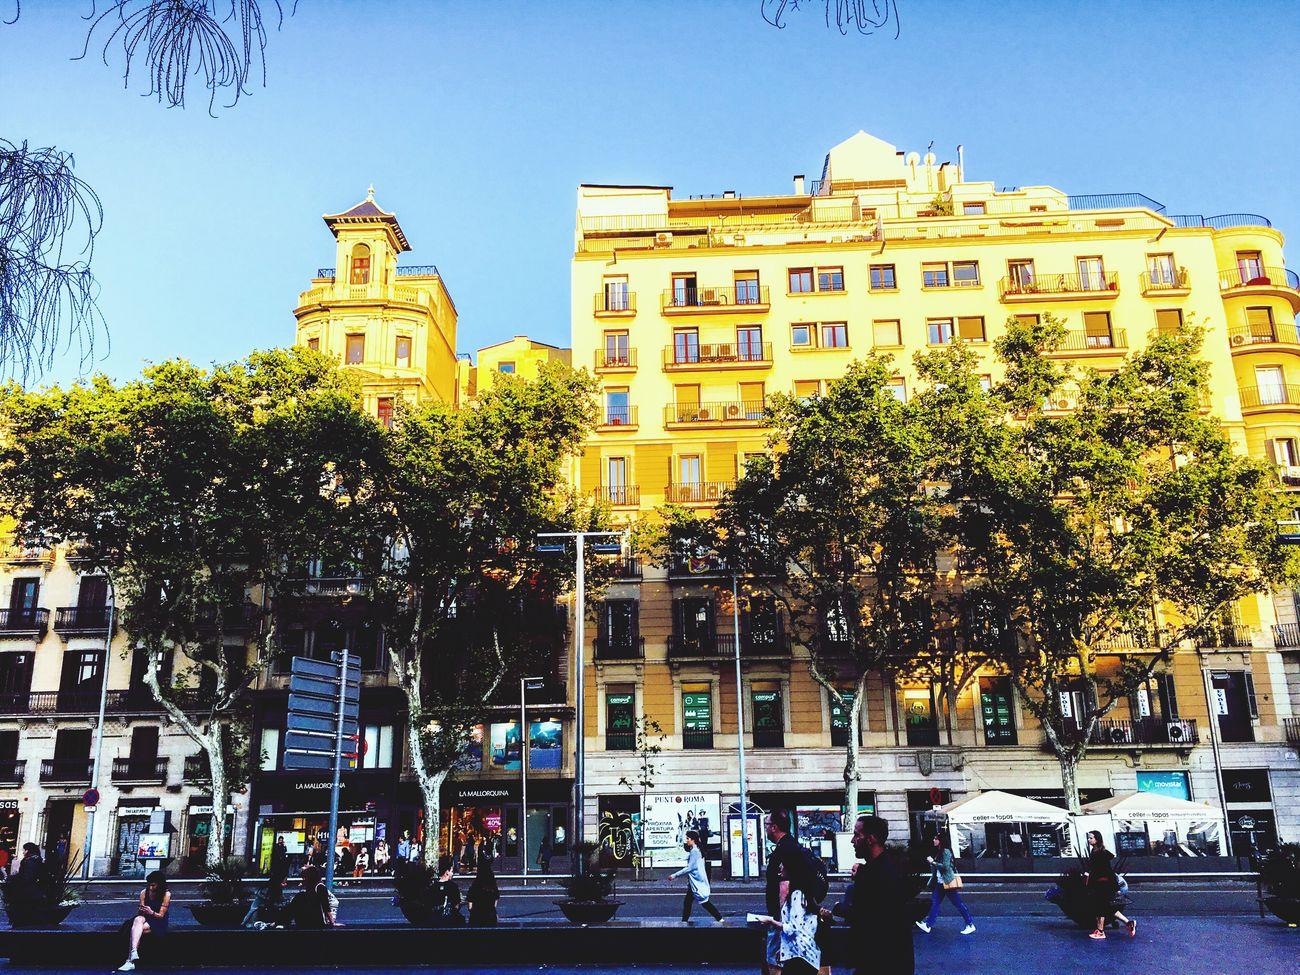 Plaça Universitat. Streetphotography City Life Moving Summertime June 2016 Mycity